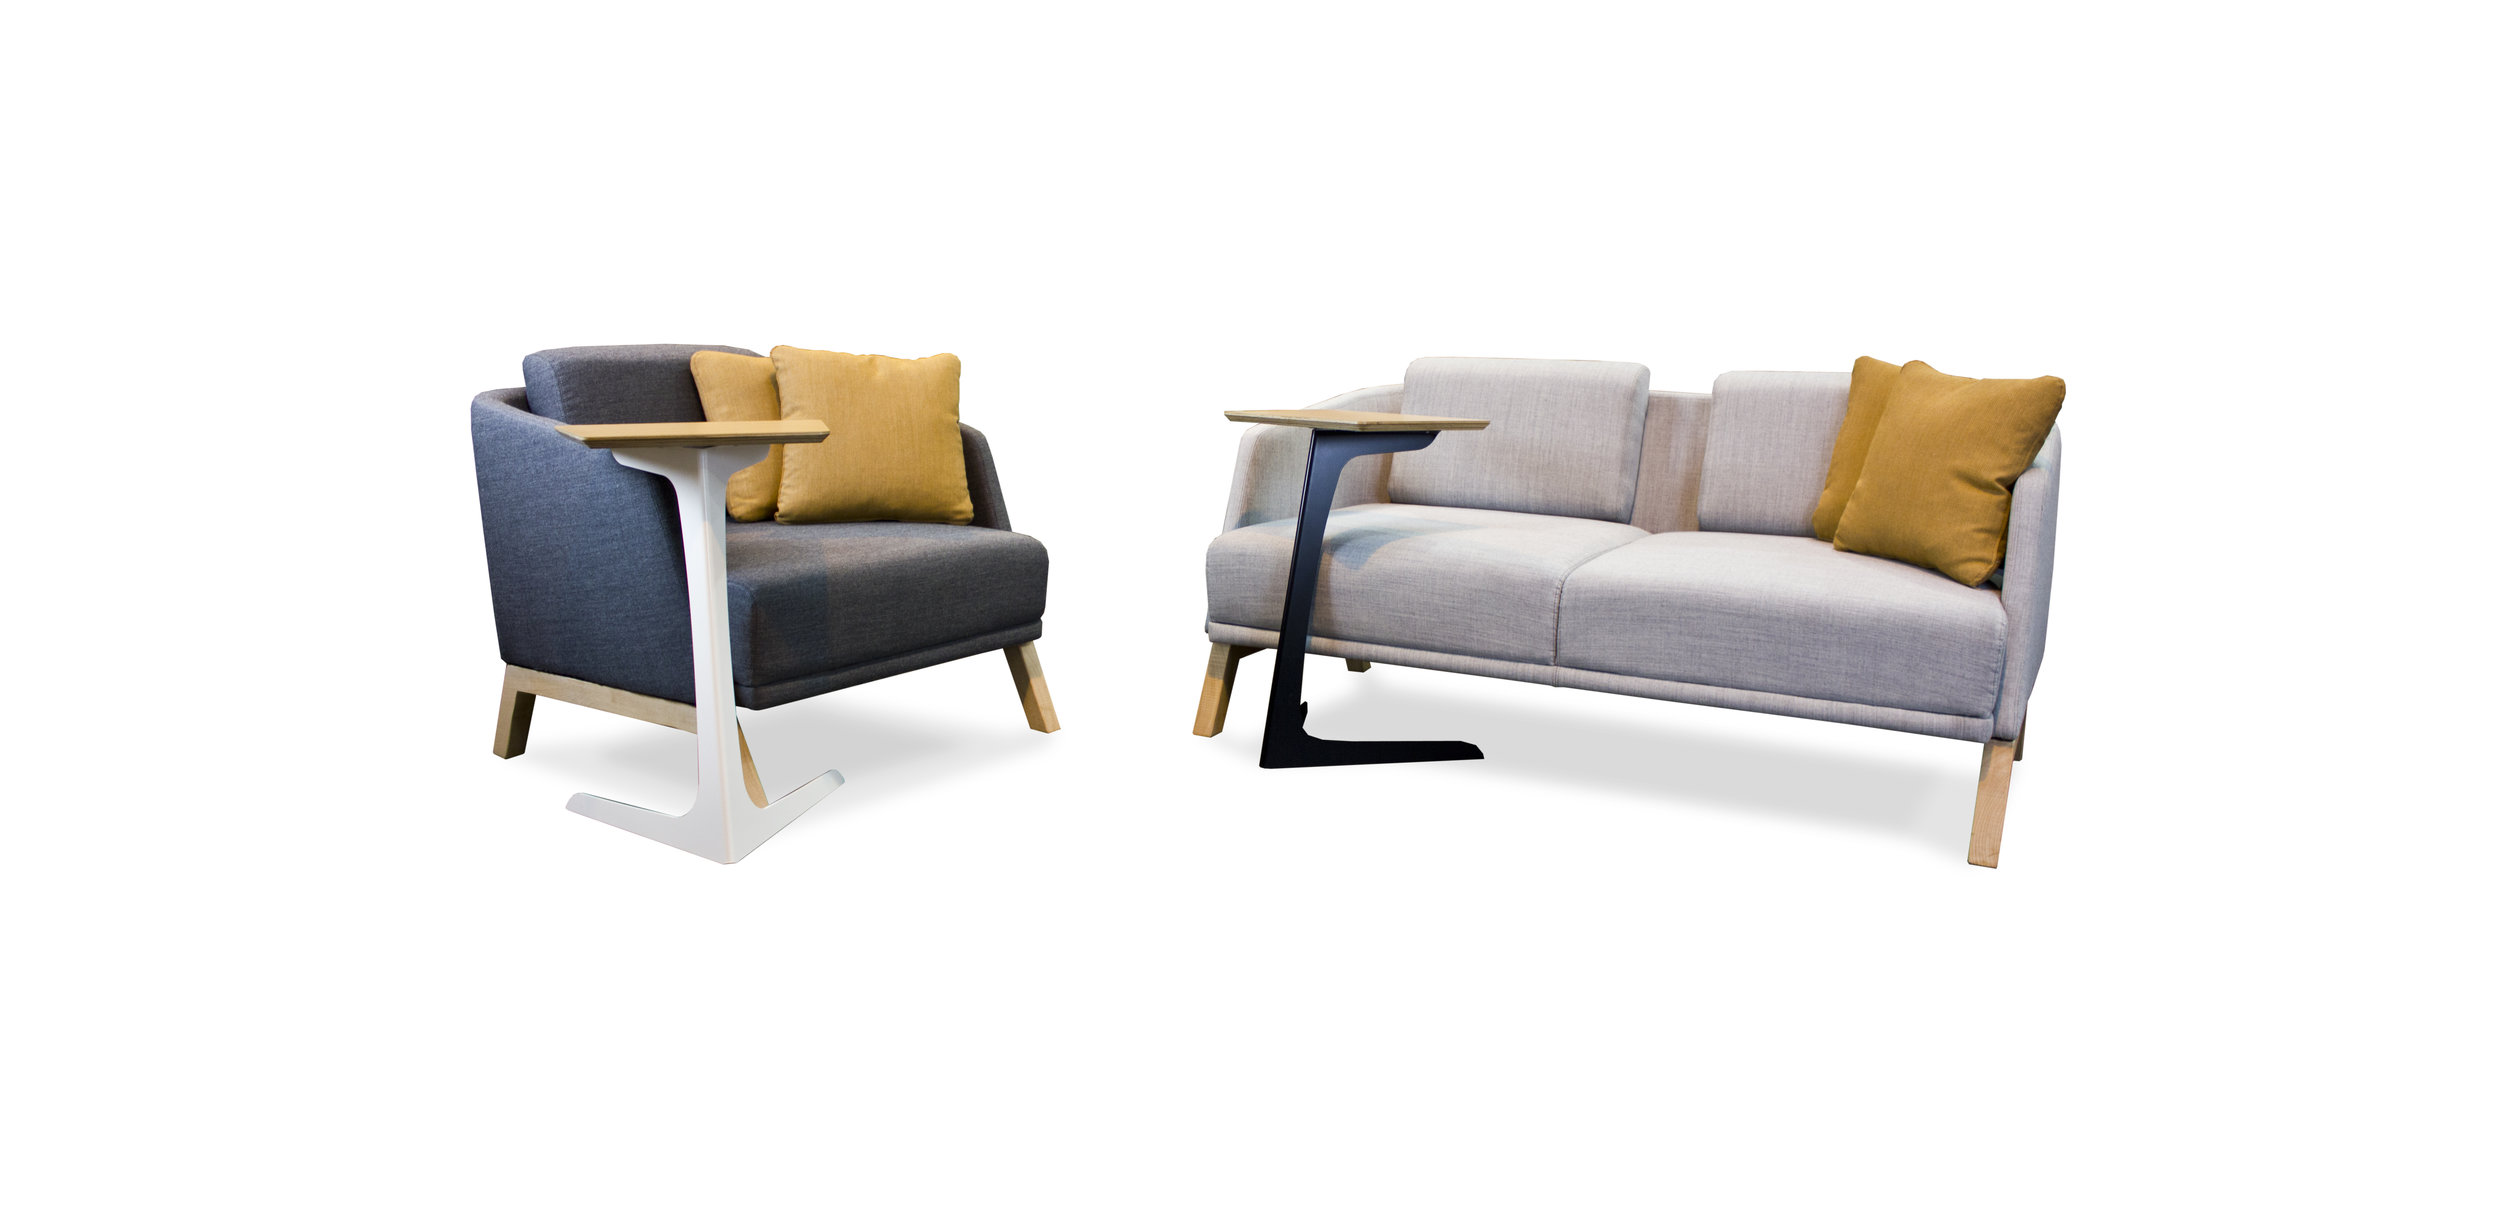 Walter Sofa and Chair 4.jpg